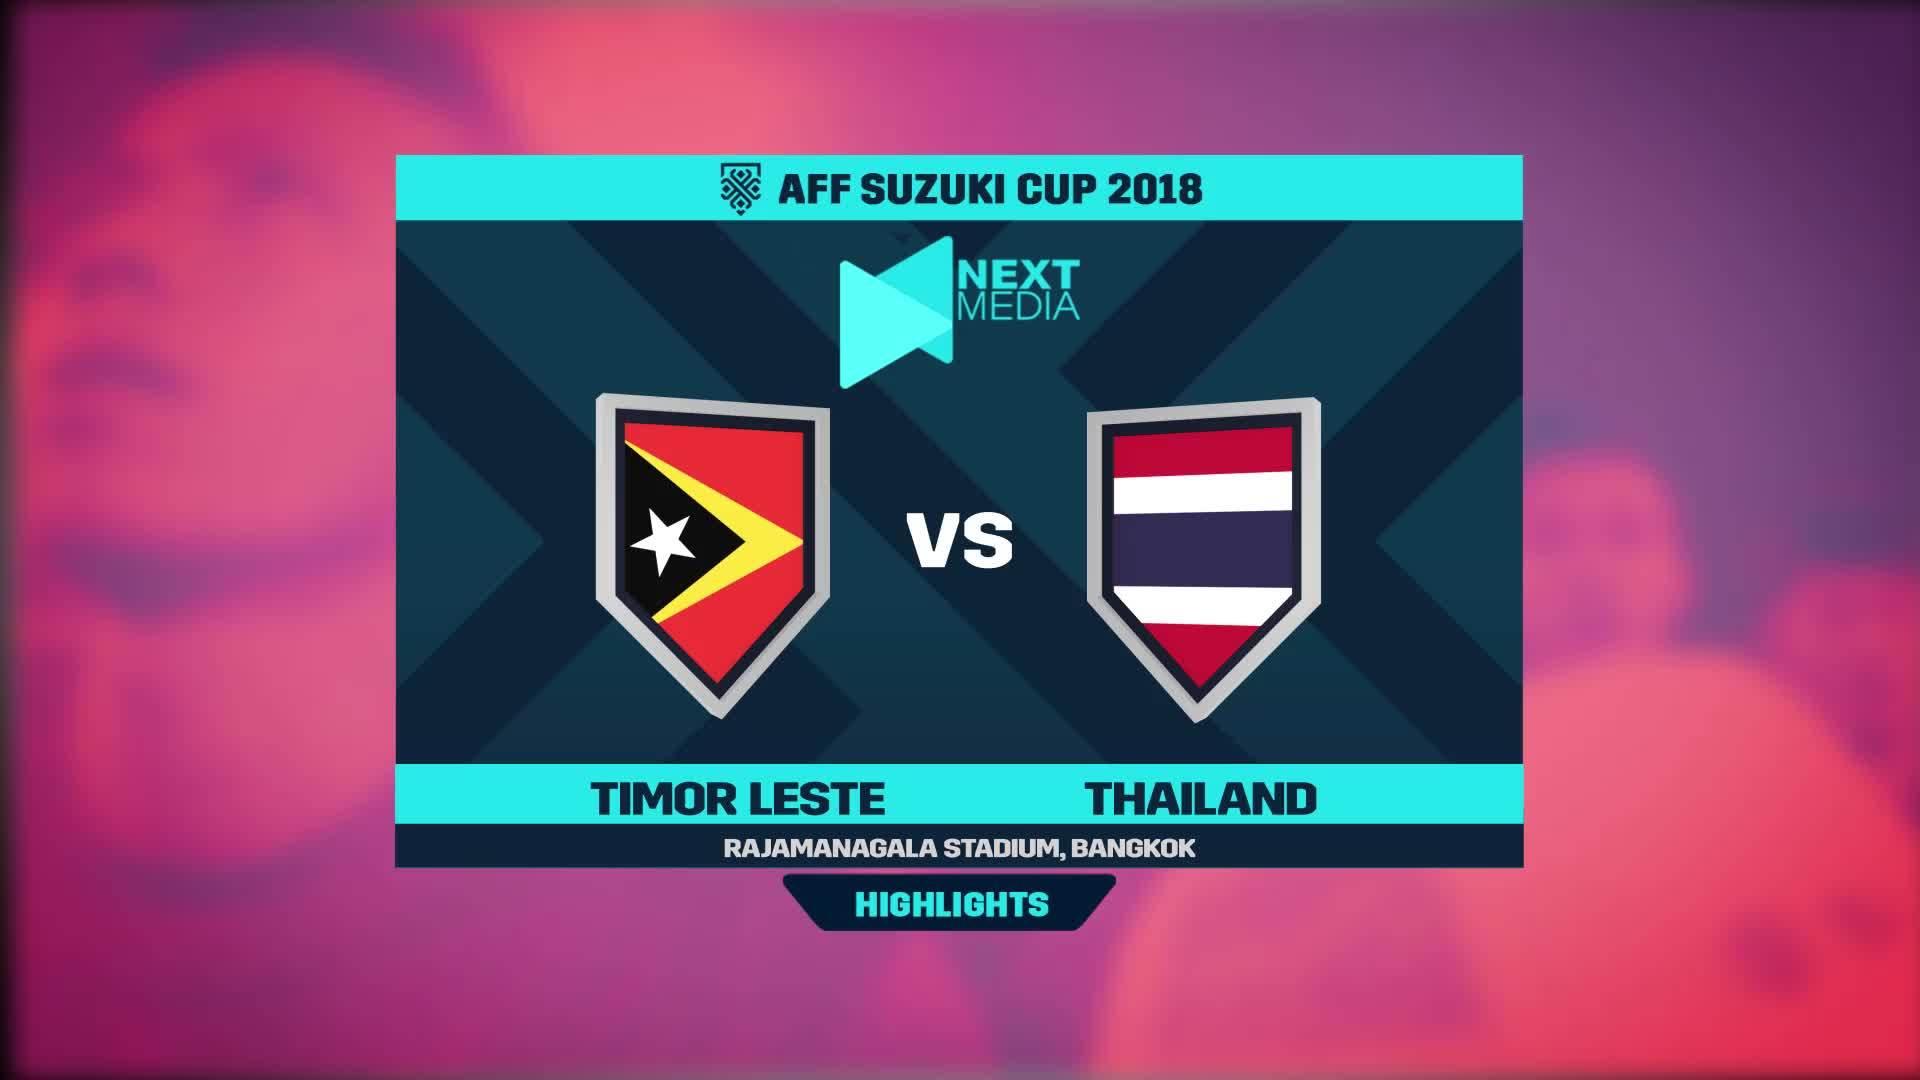 Timor Leste 0-7 Thái Lan